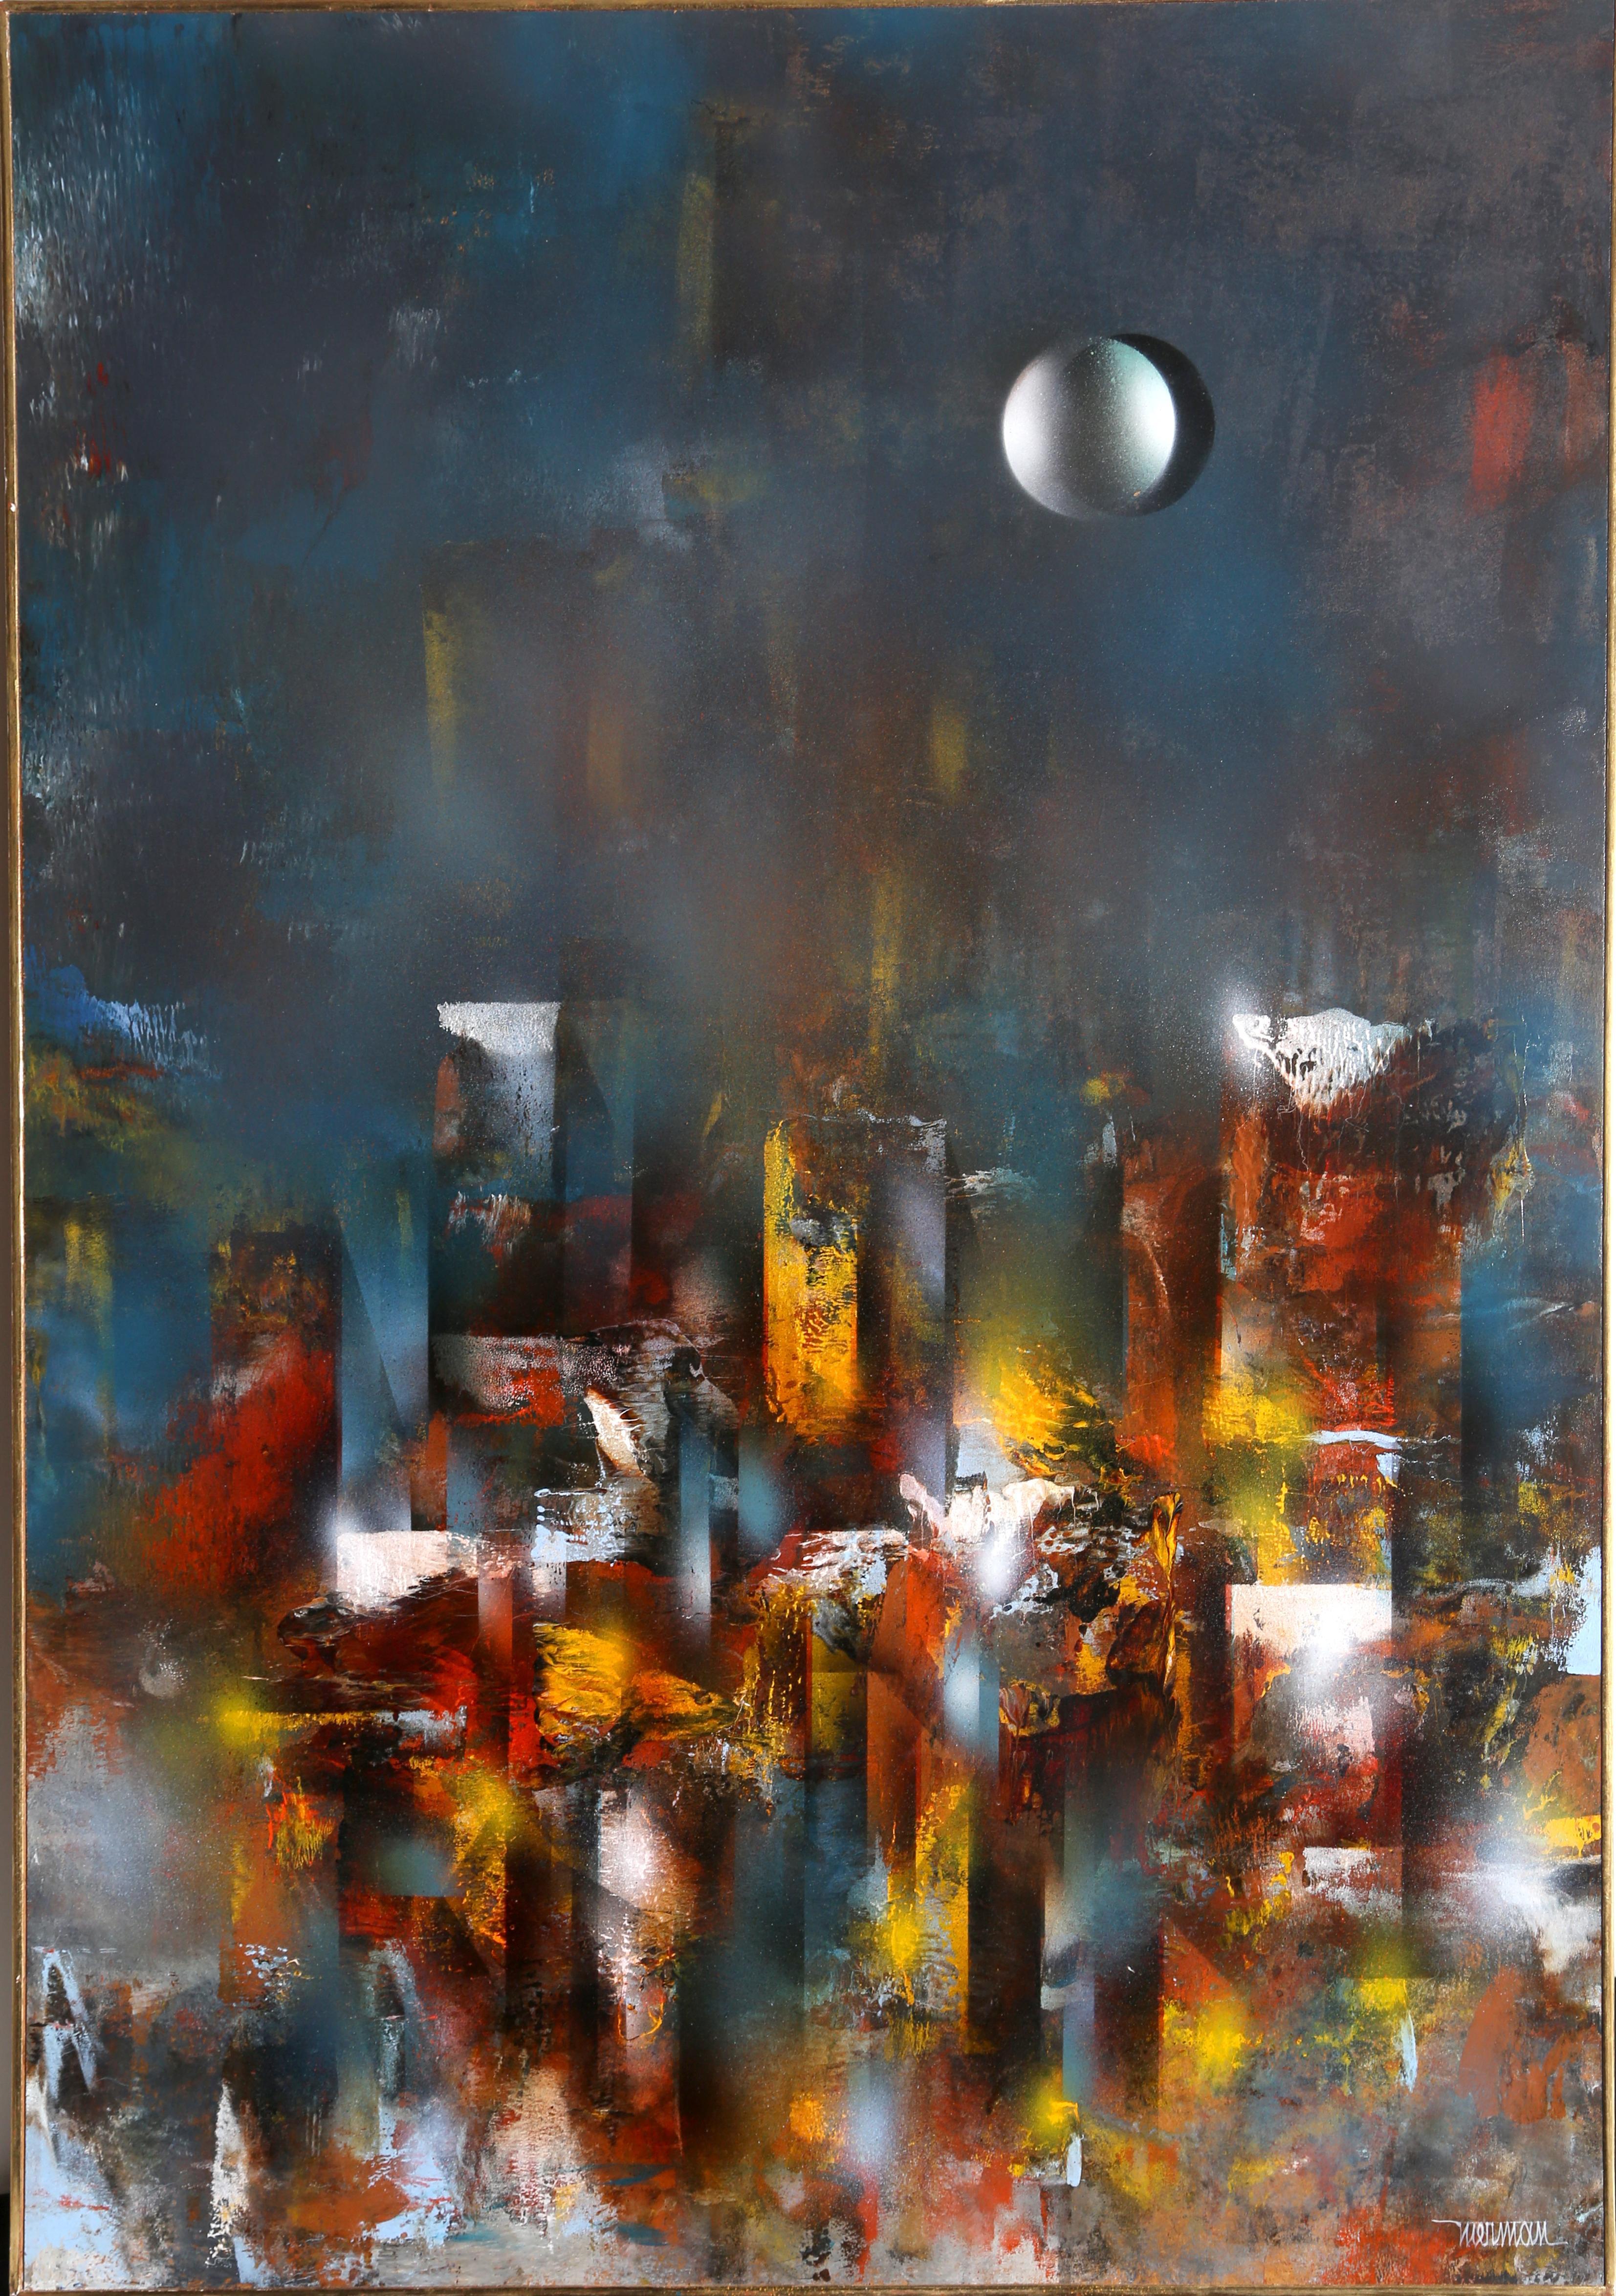 Ruins, Large Abstract City Painting by Leonardo Nierman